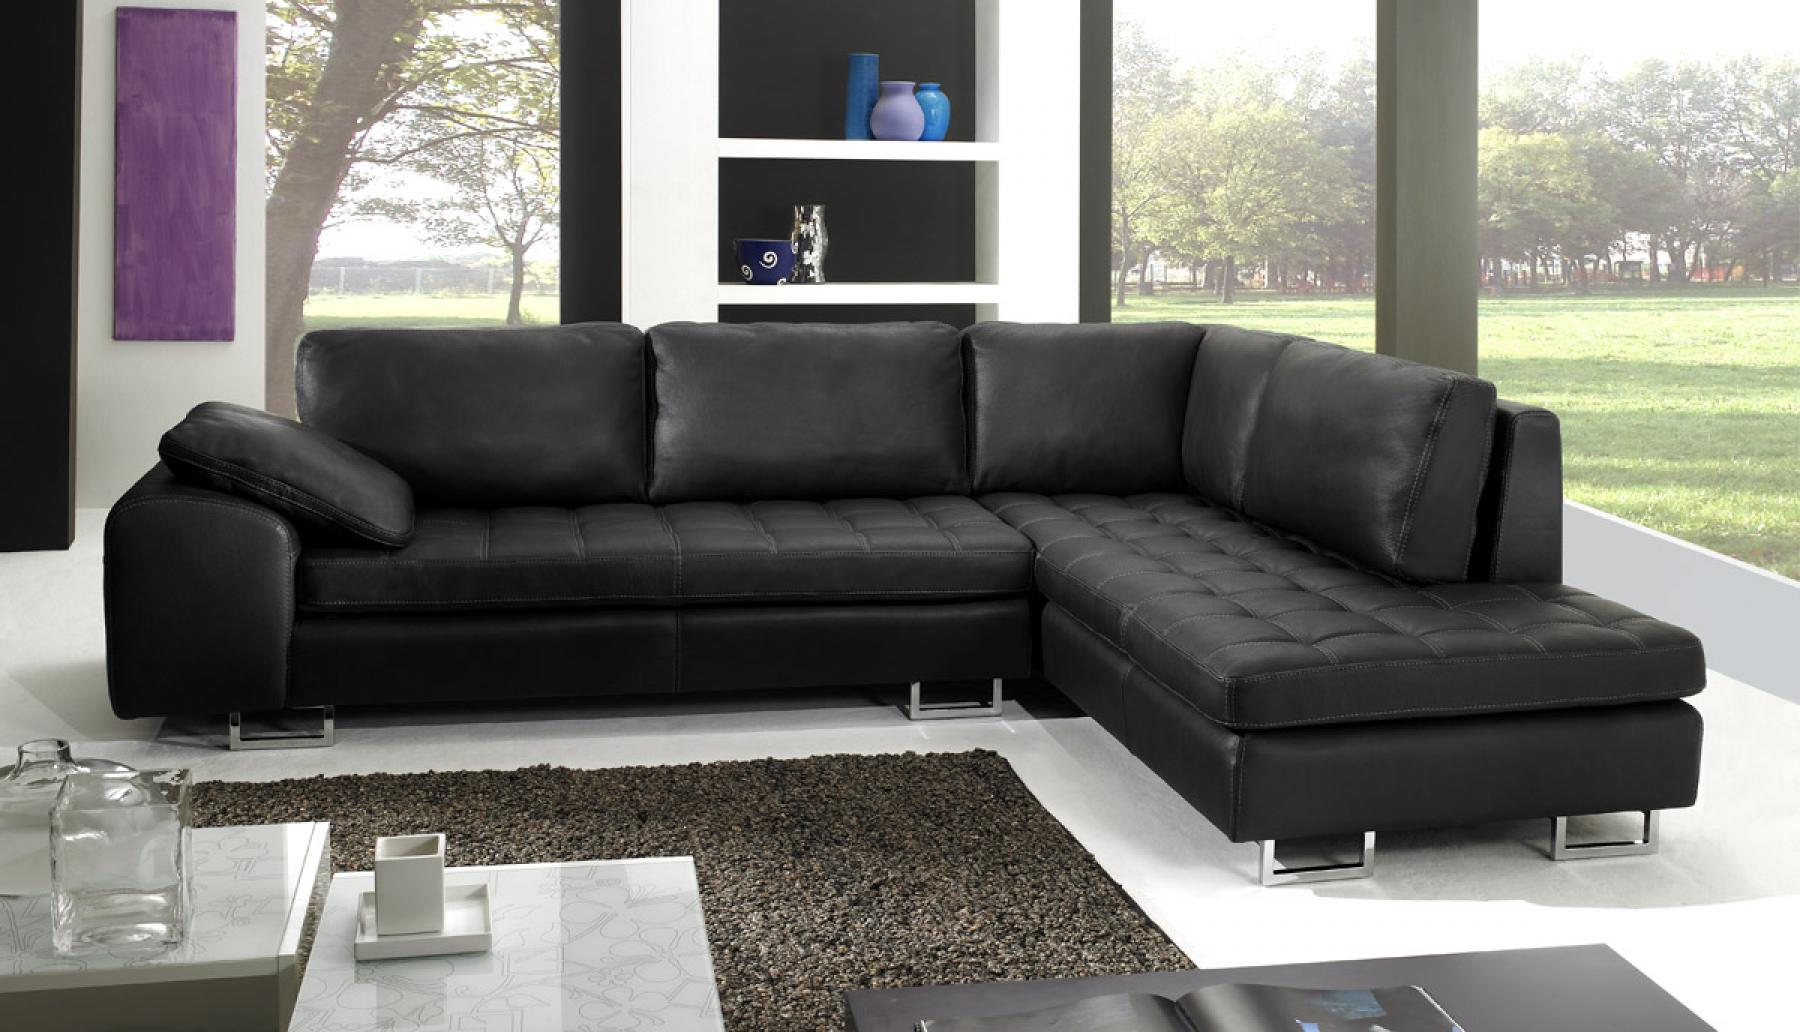 canape design italien cuir canap design italien cuir monza tulle brive cahors montauban en. Black Bedroom Furniture Sets. Home Design Ideas